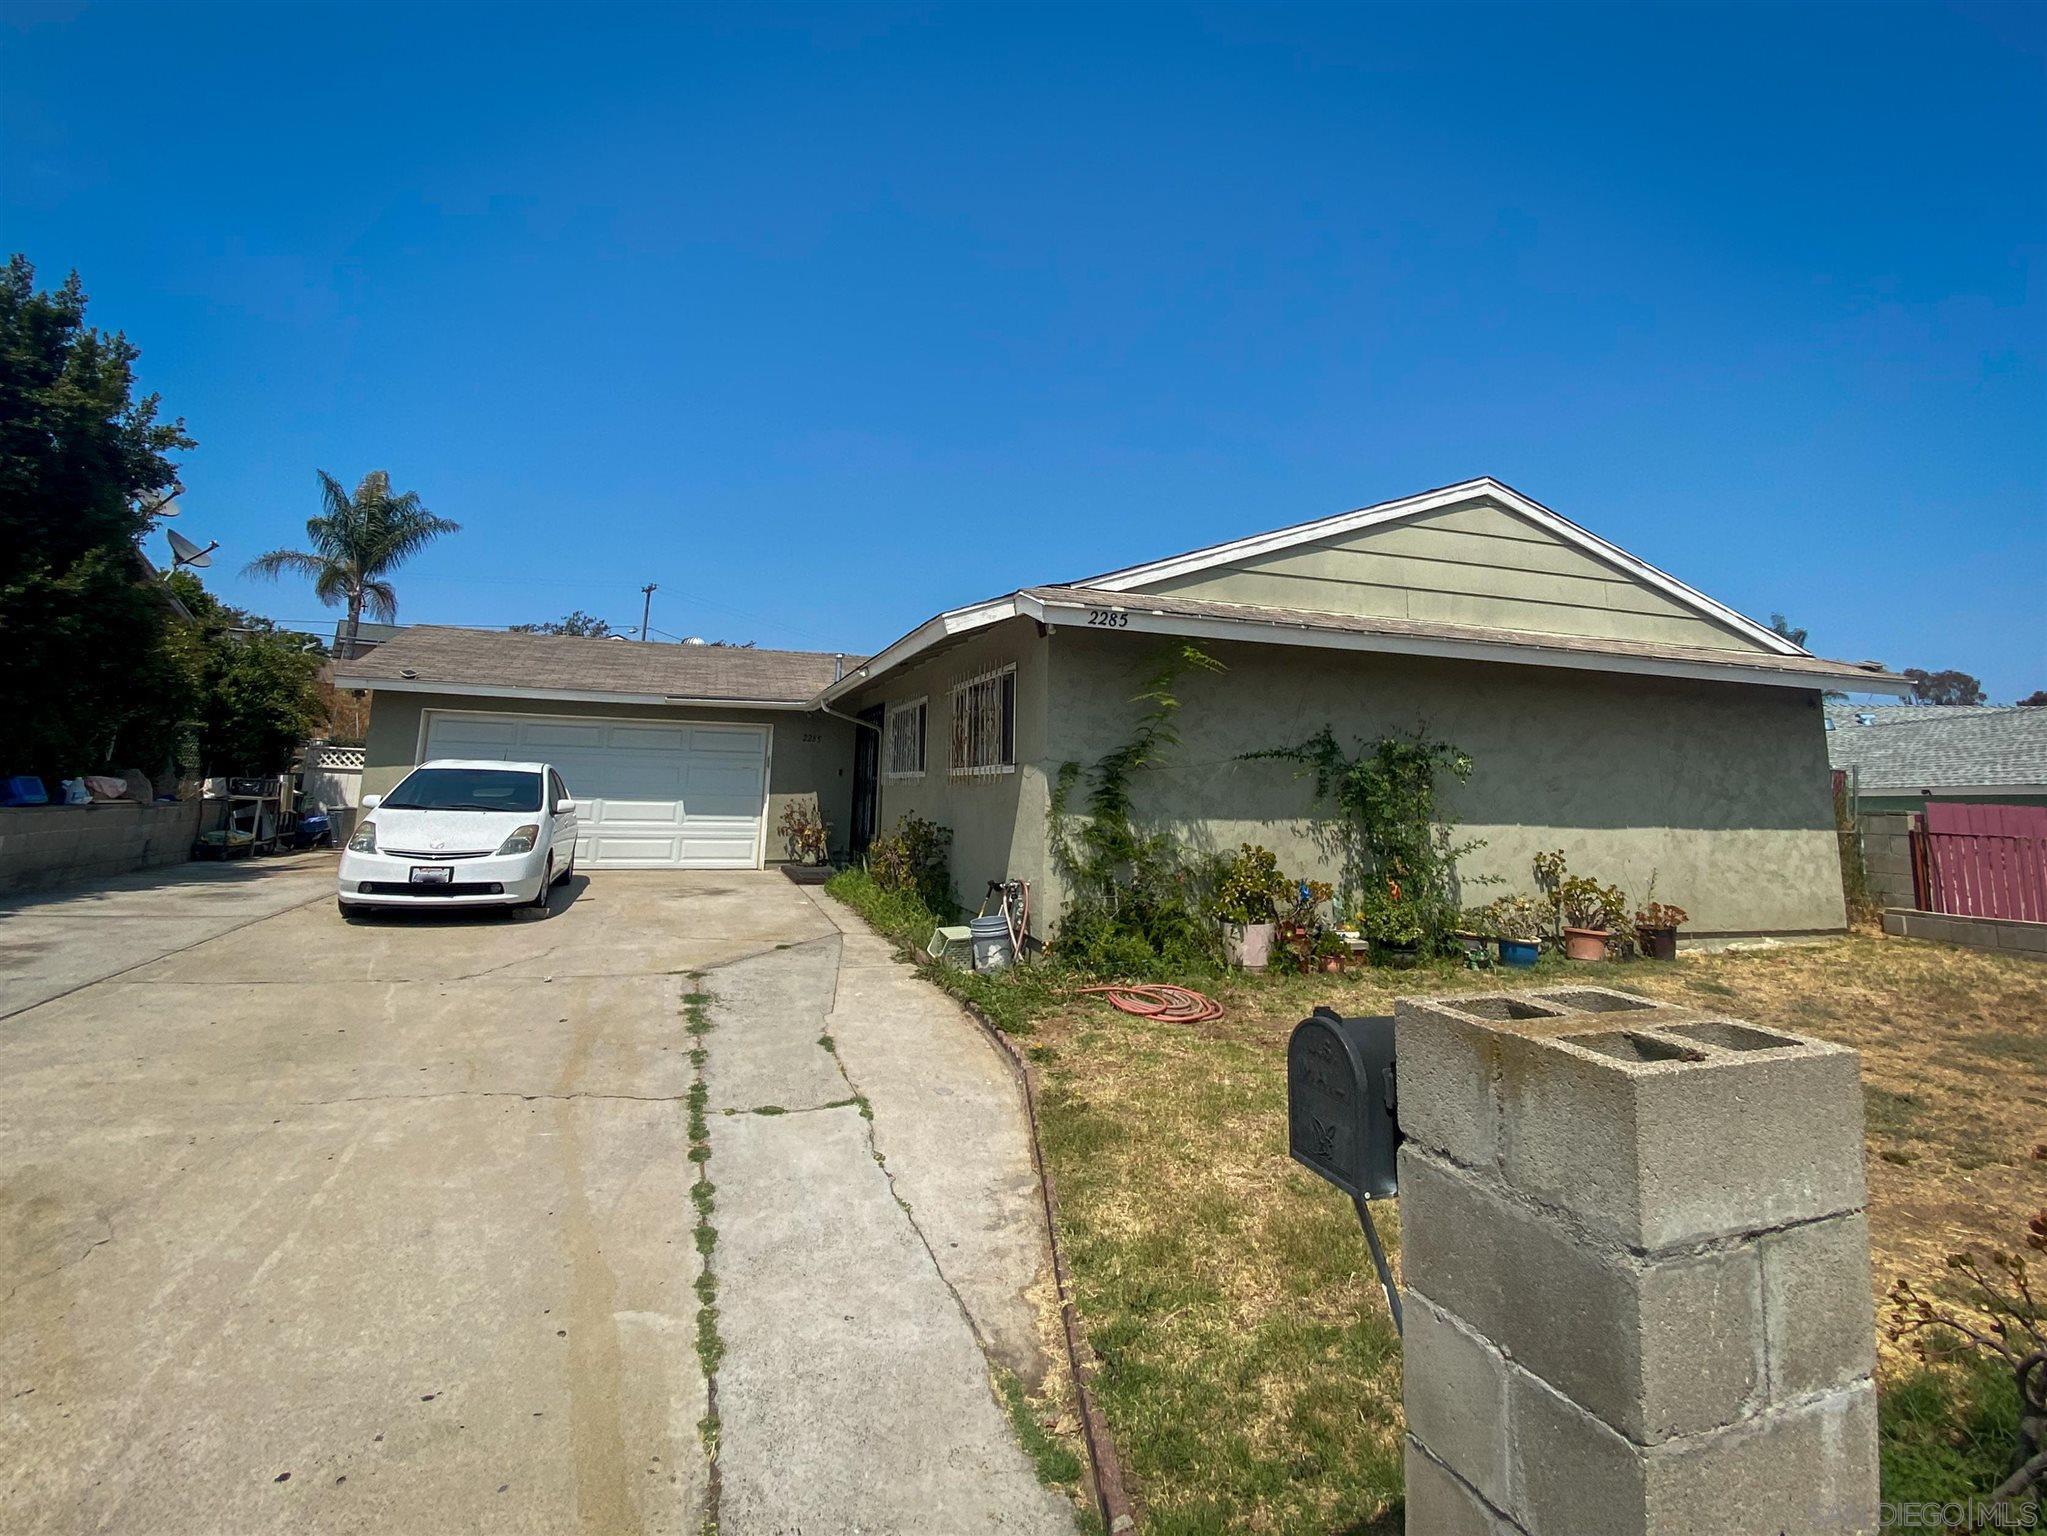 2285 Crandall Drive, San Diego, CA 92111